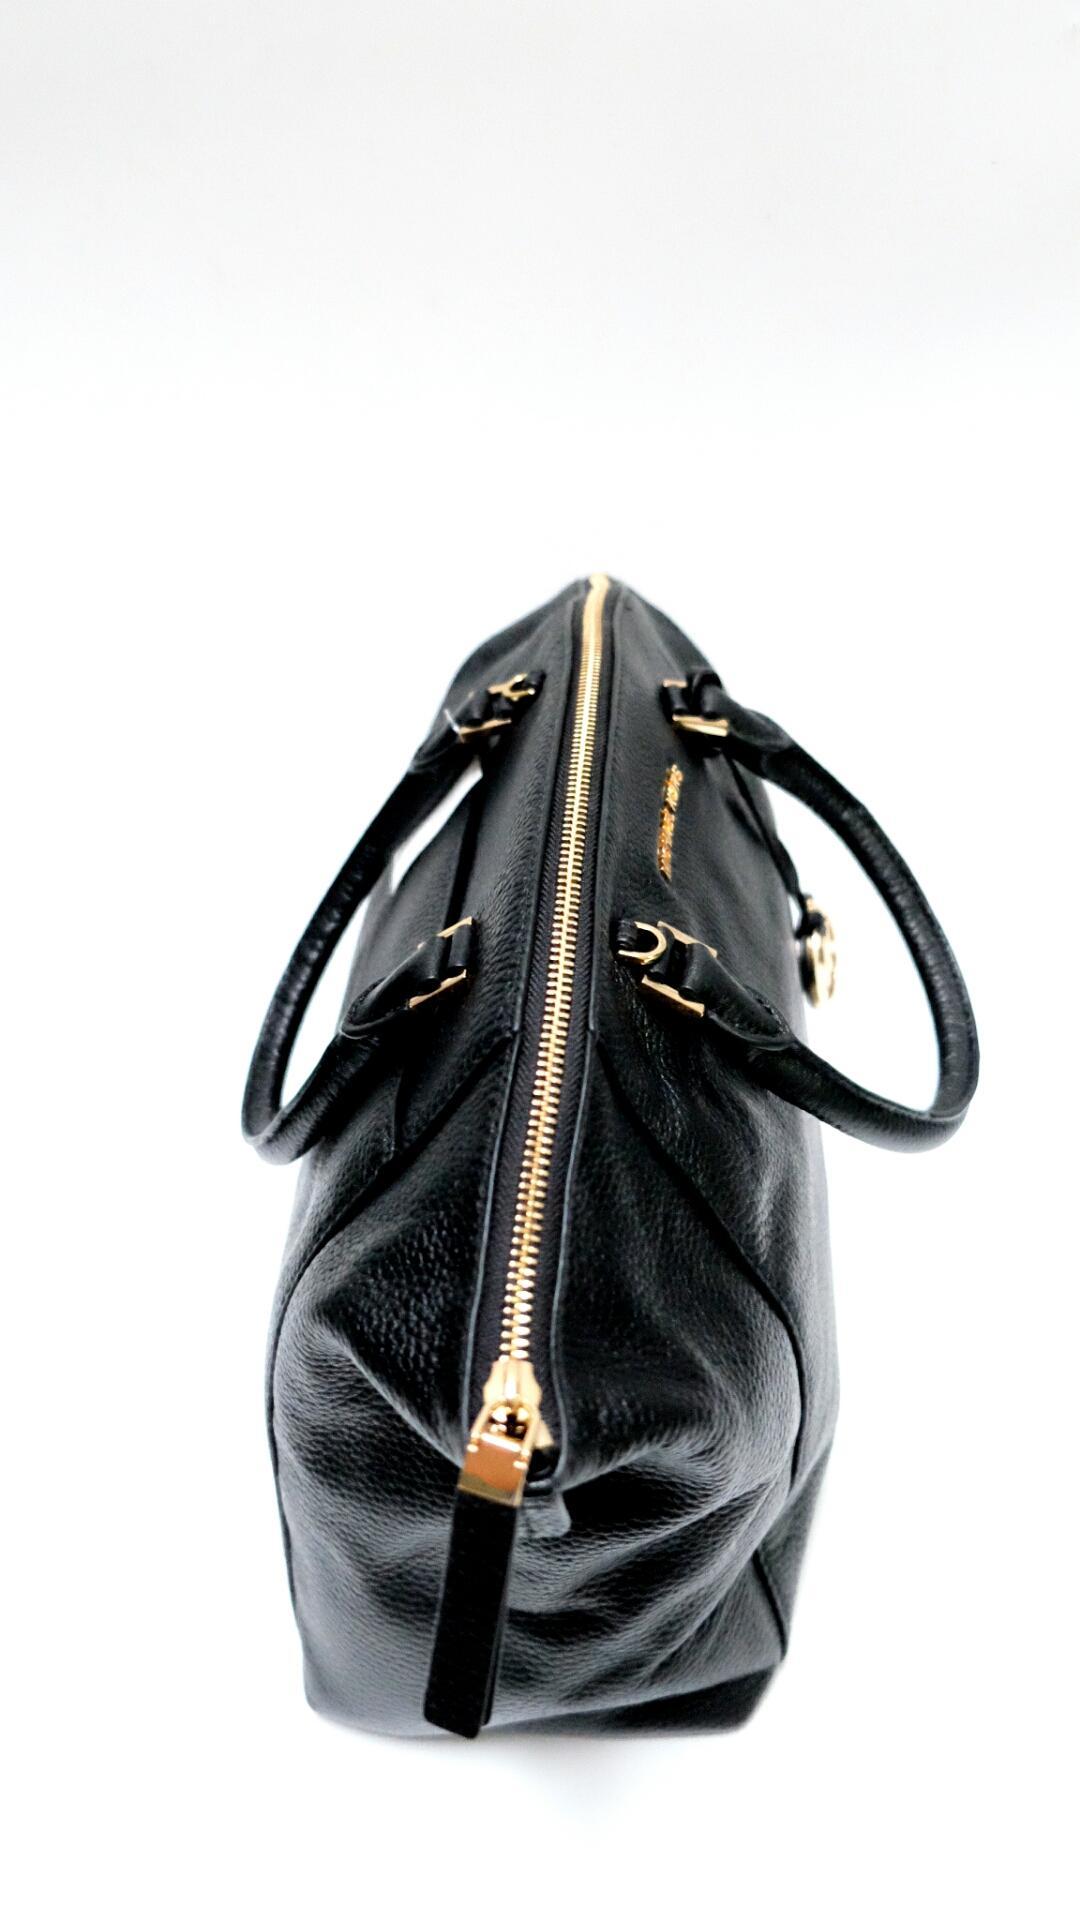 0841dbf5c2df15 official store michael kors riley large satchel 3 e48b6 07019